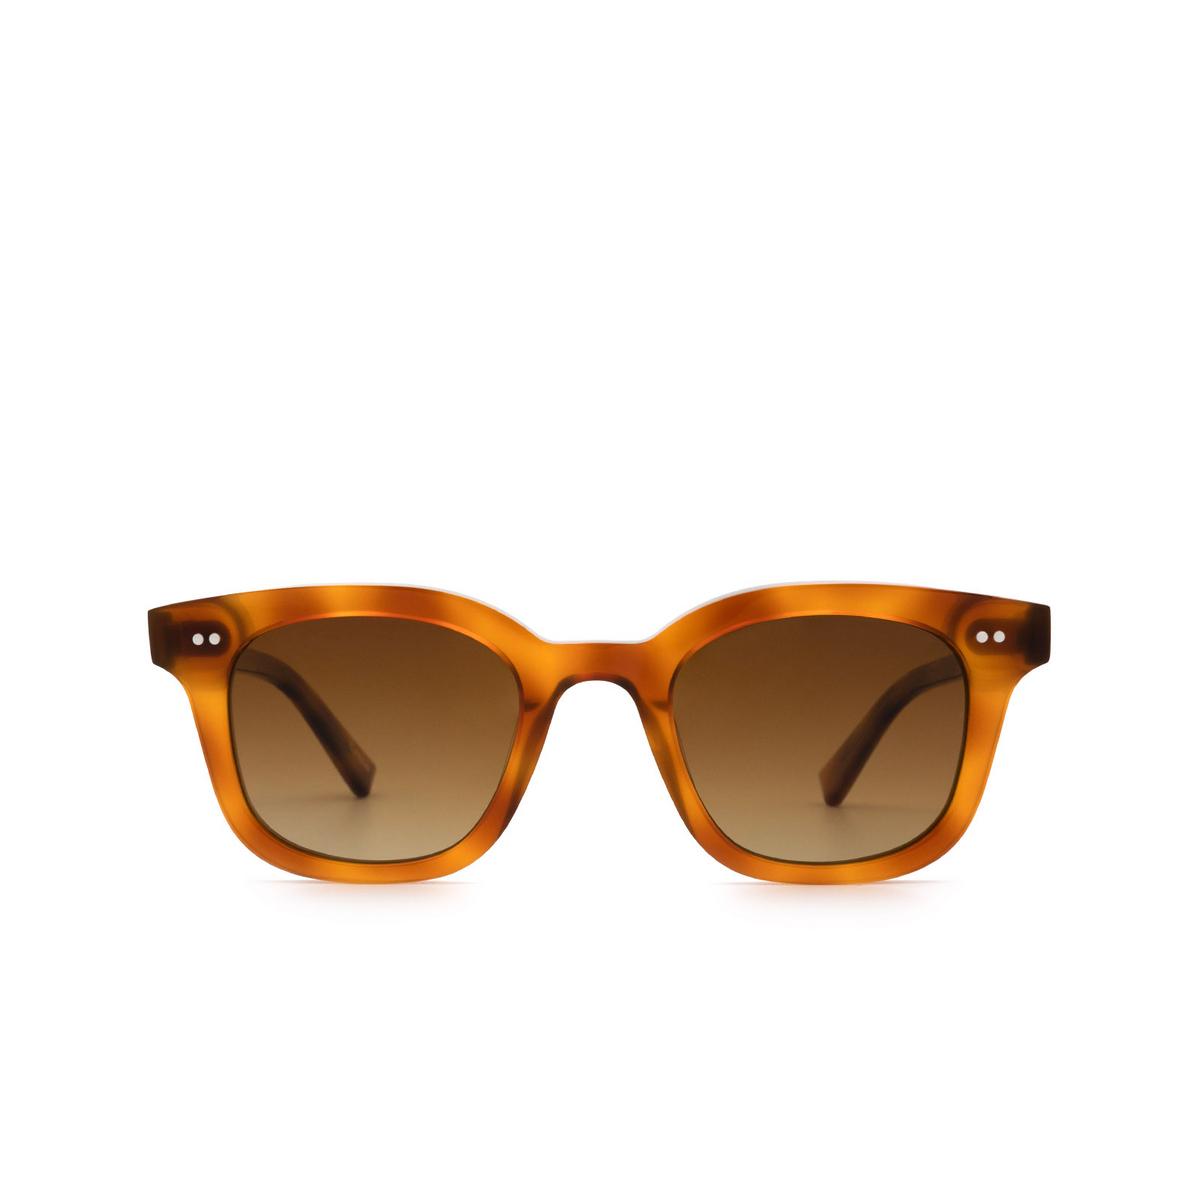 Chimi® Square Sunglasses: 02 color Havana - front view.